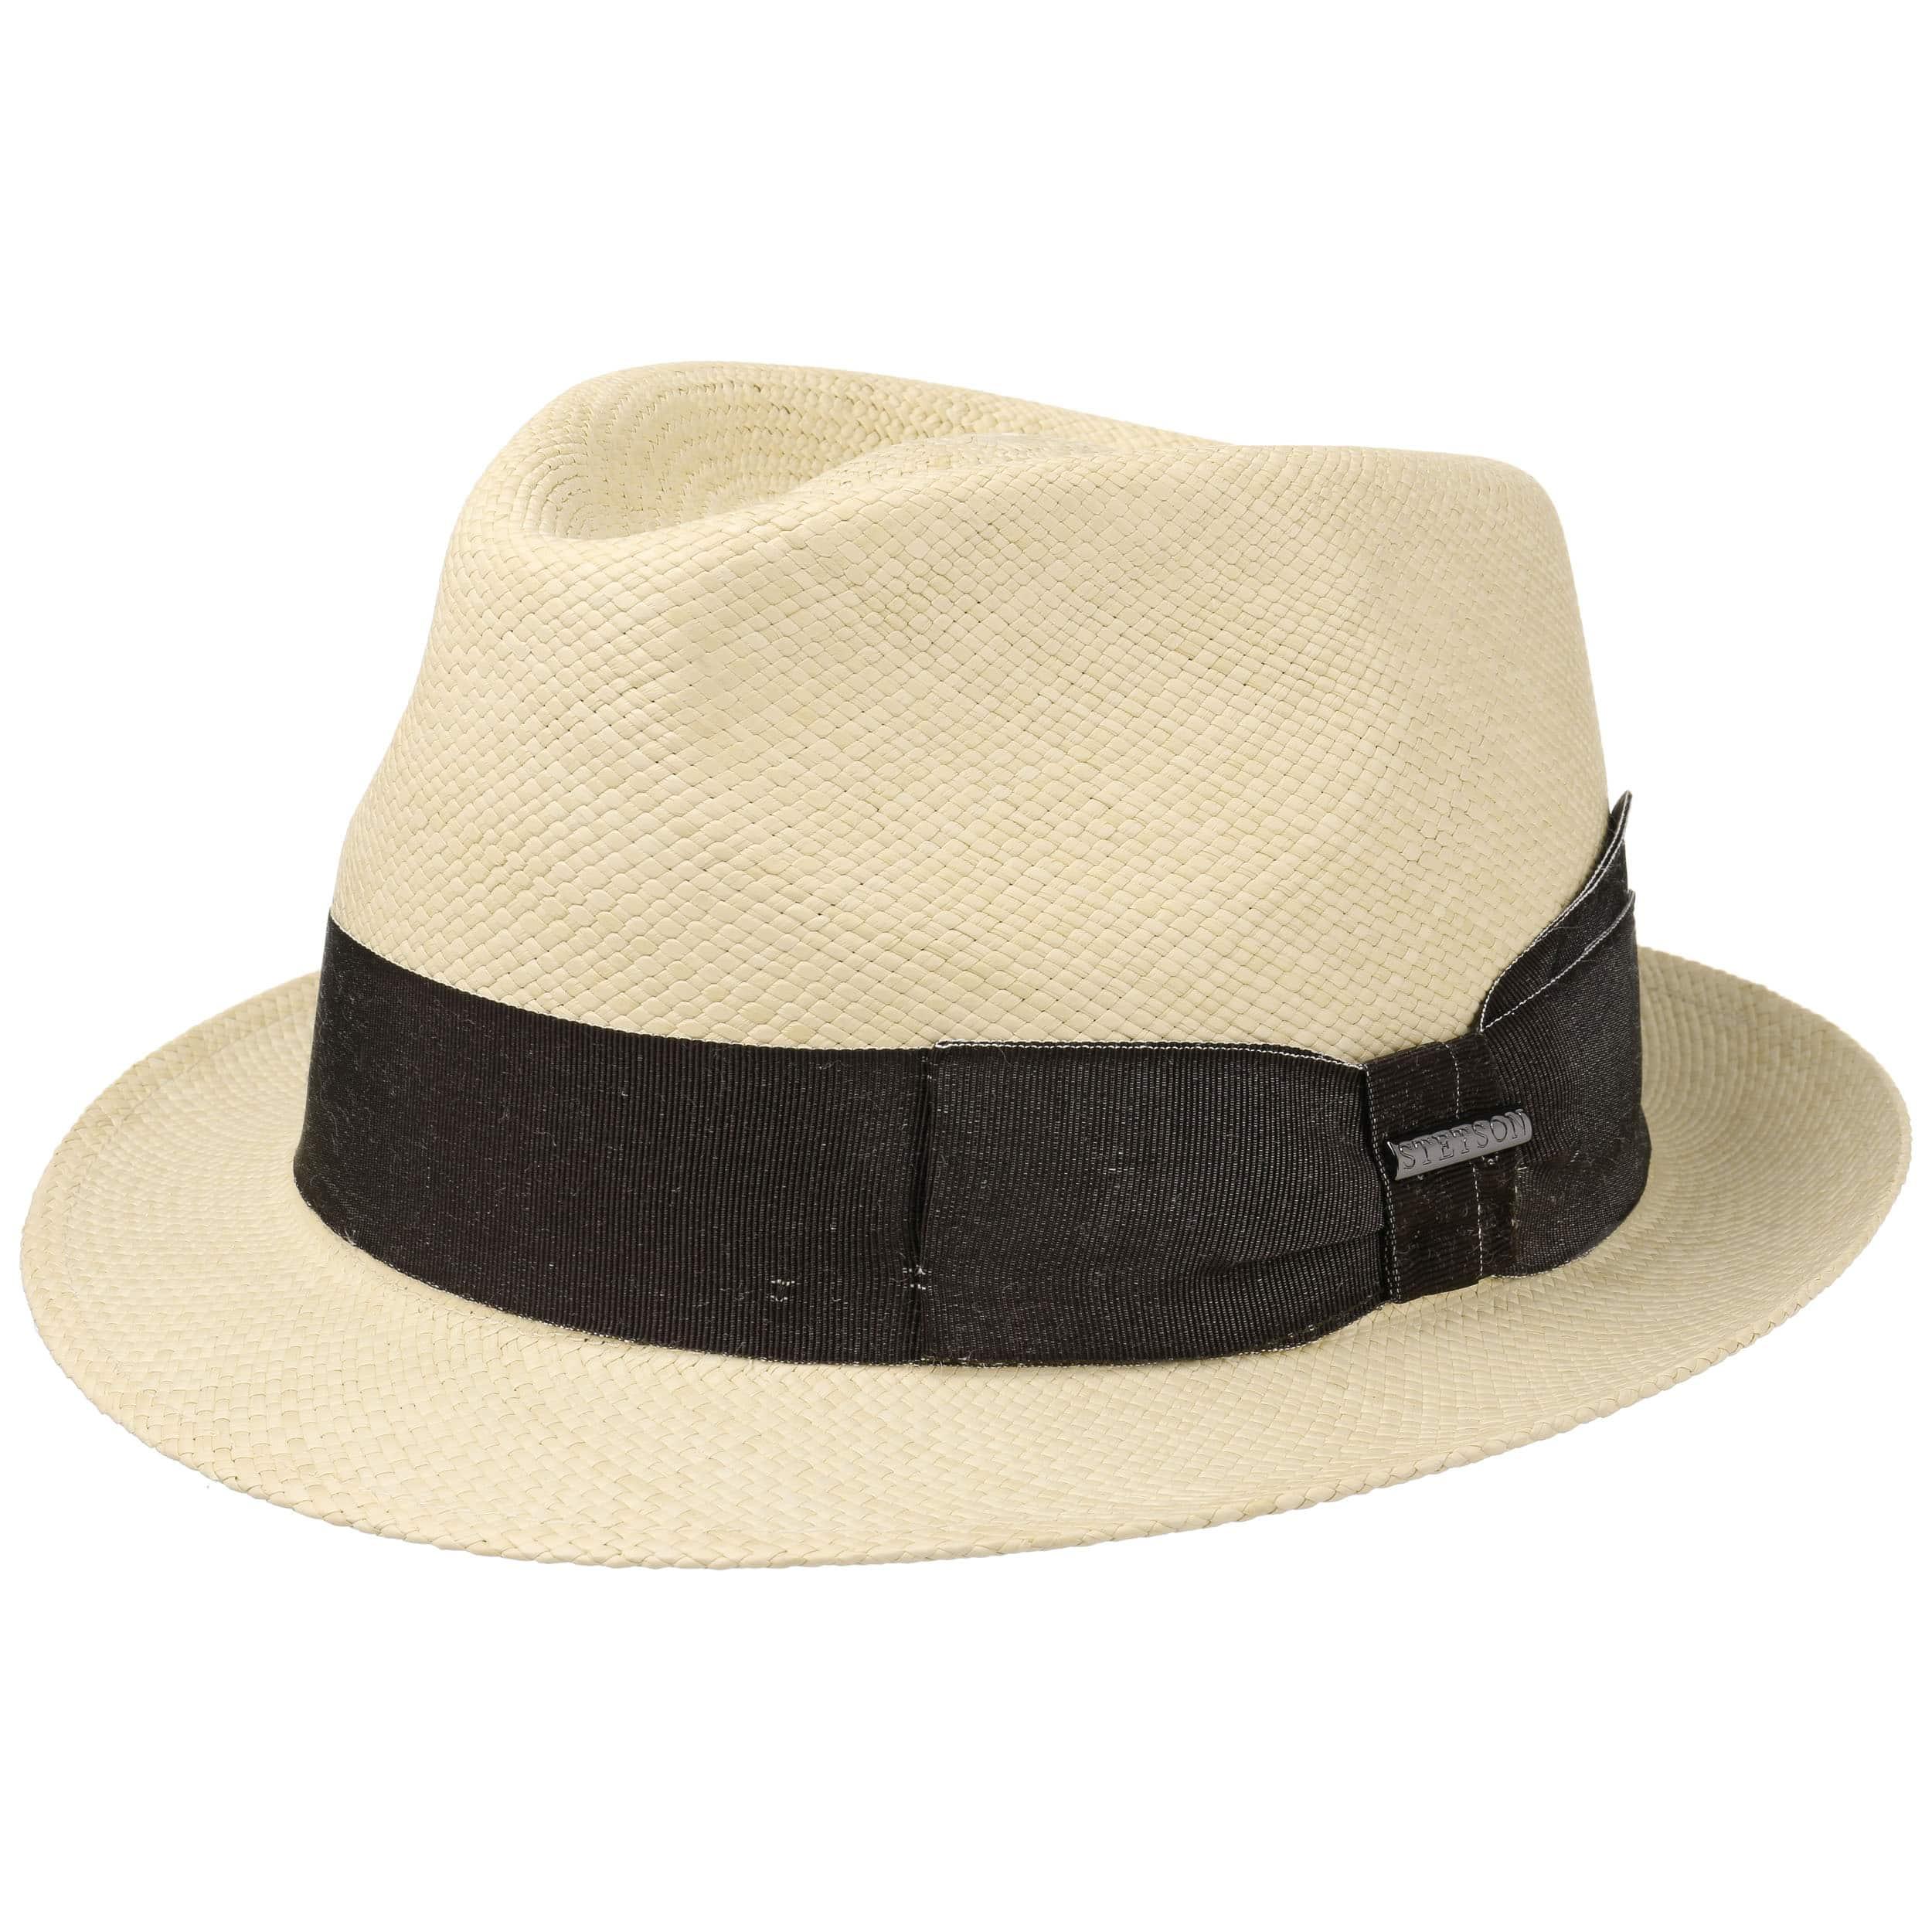 76065e40 ... Cayo Trilby Panama Hat by Stetson - nature 2